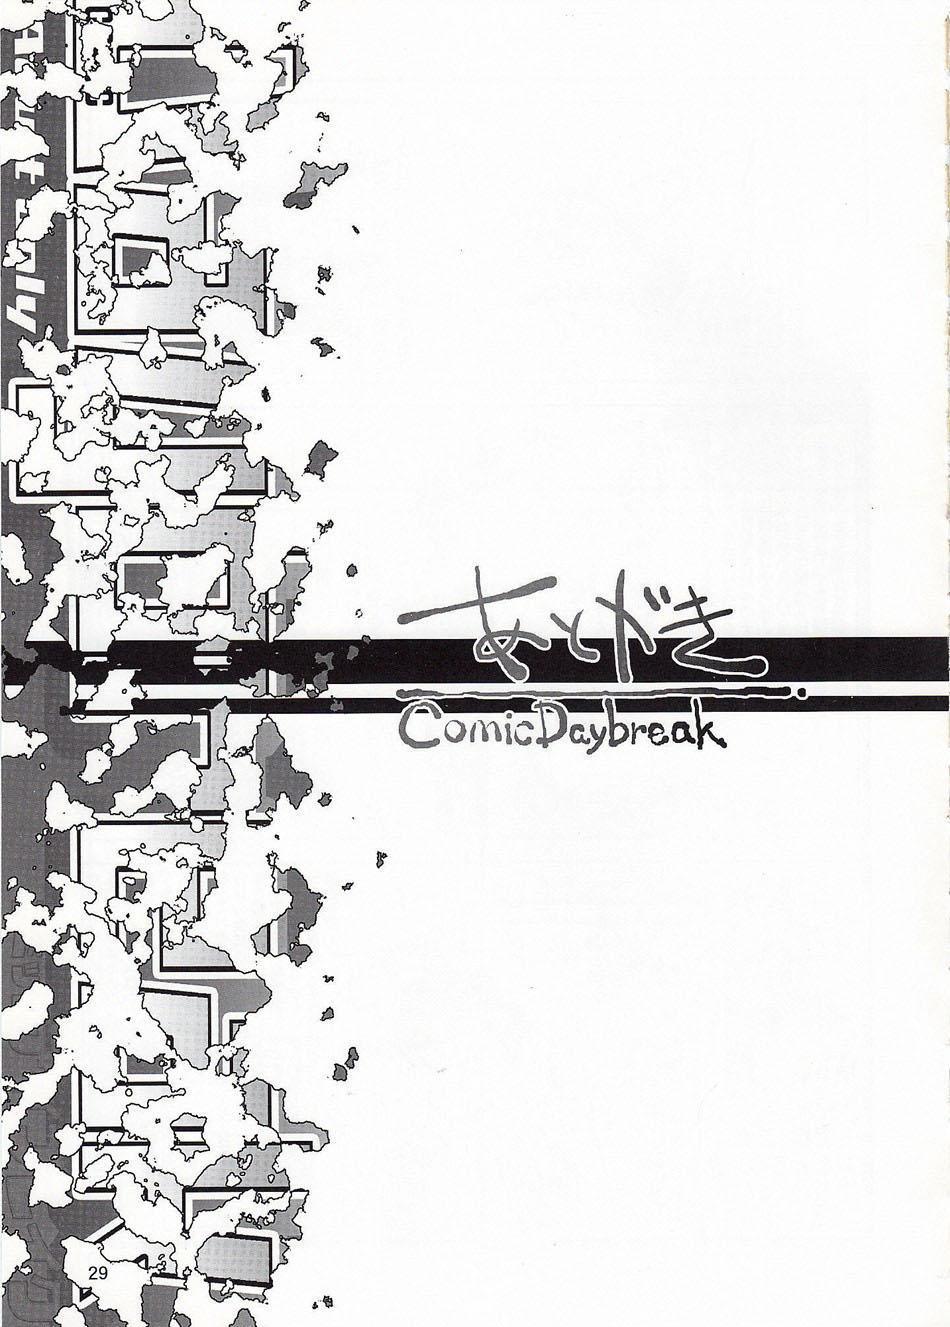 COMIC Daybreak vol.5 26